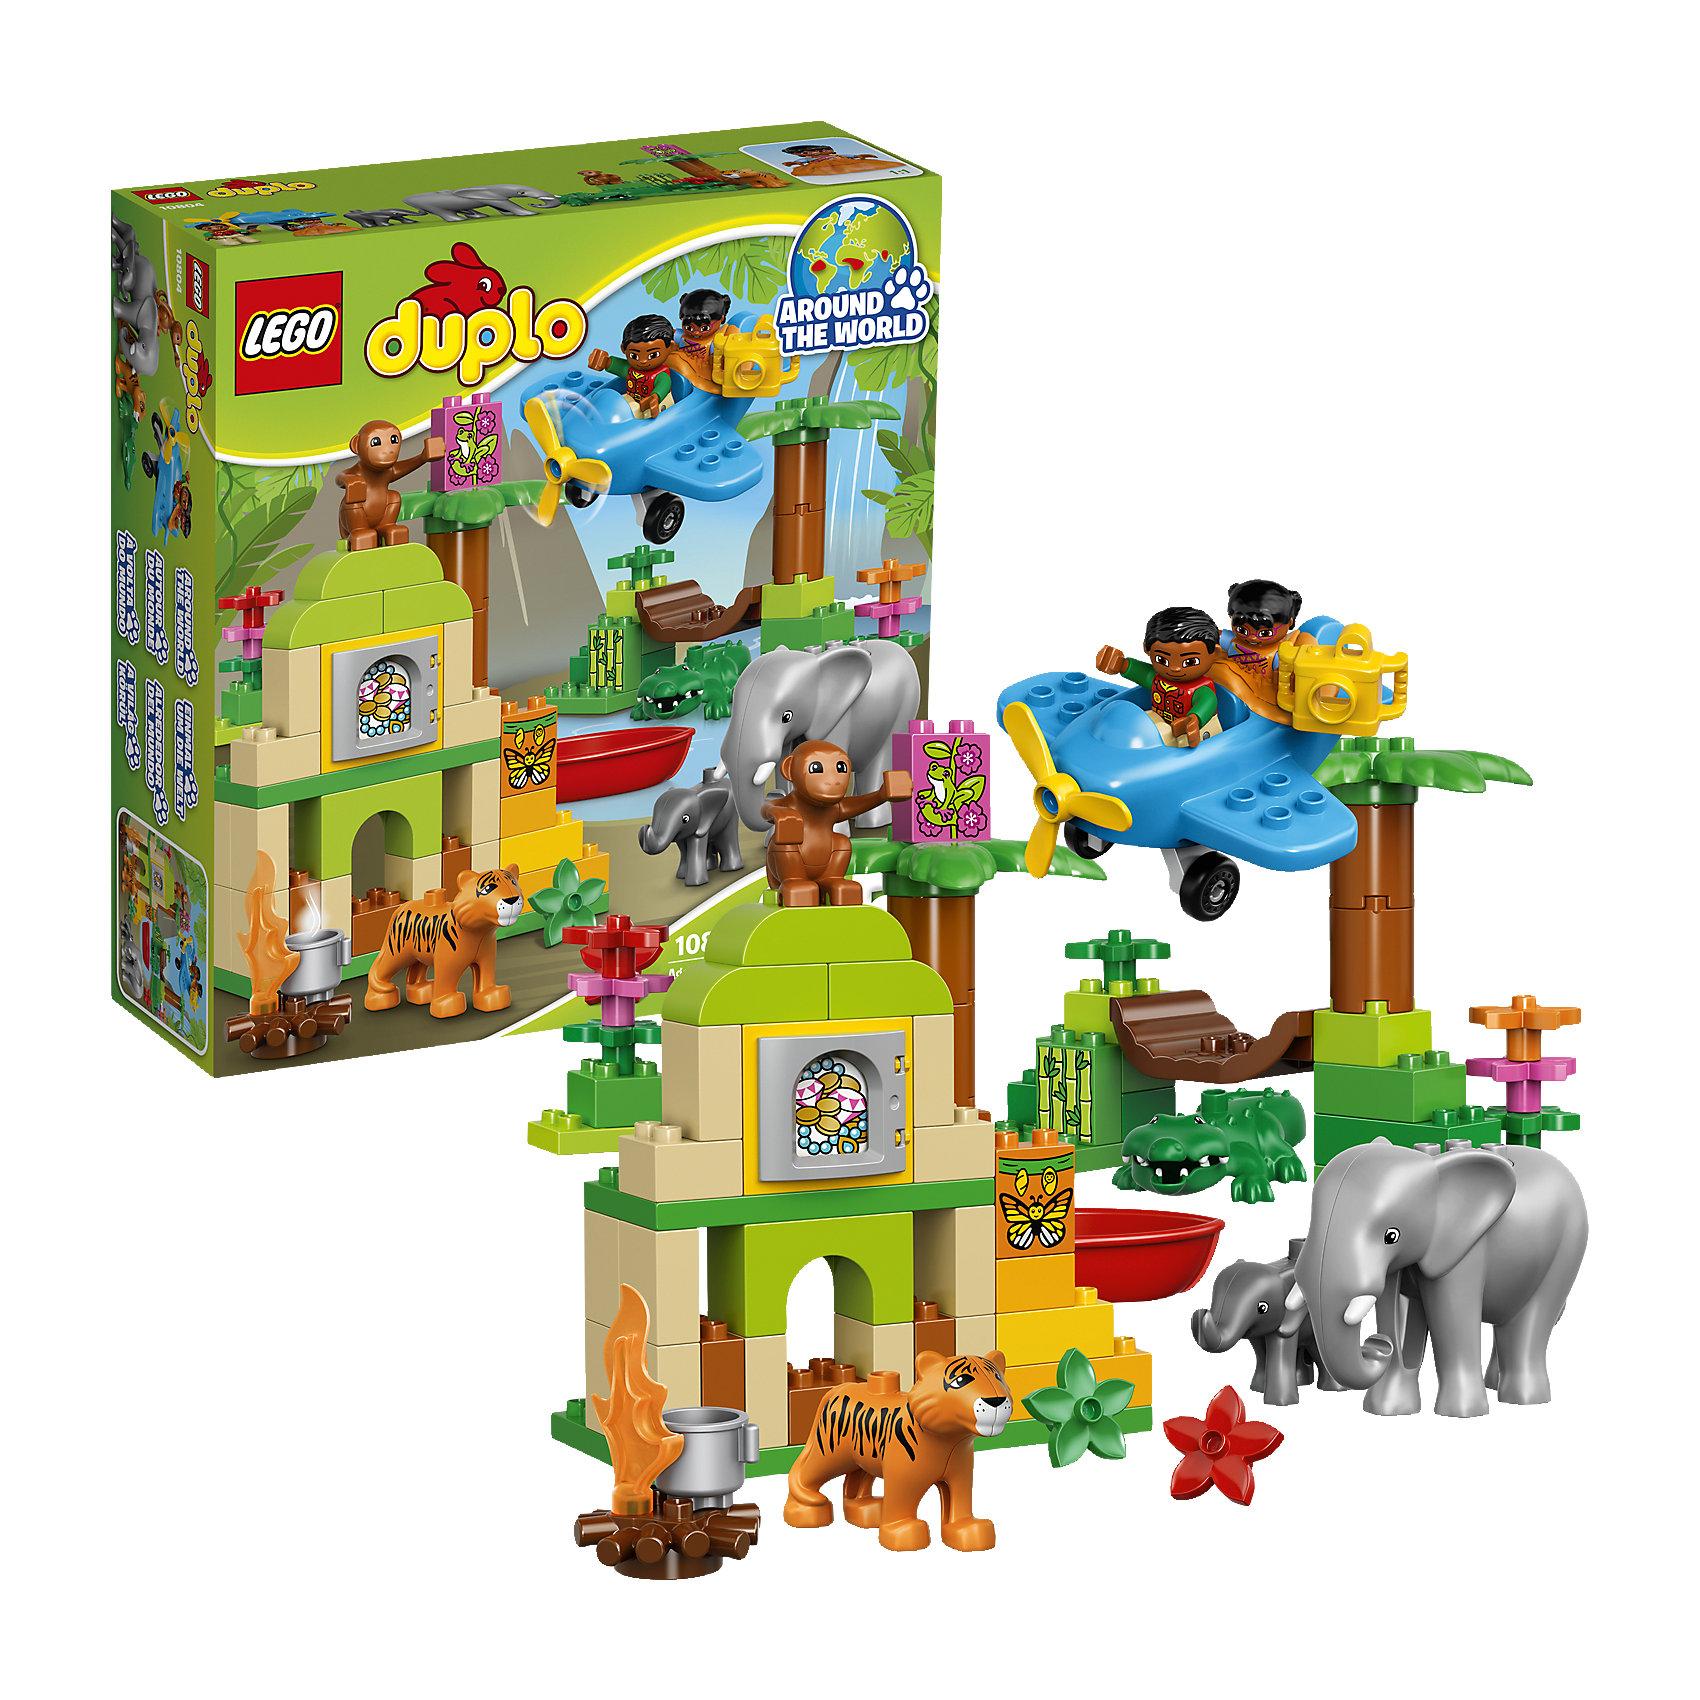 LEGO LEGO DUPLO 10804: Вокруг света: Азия